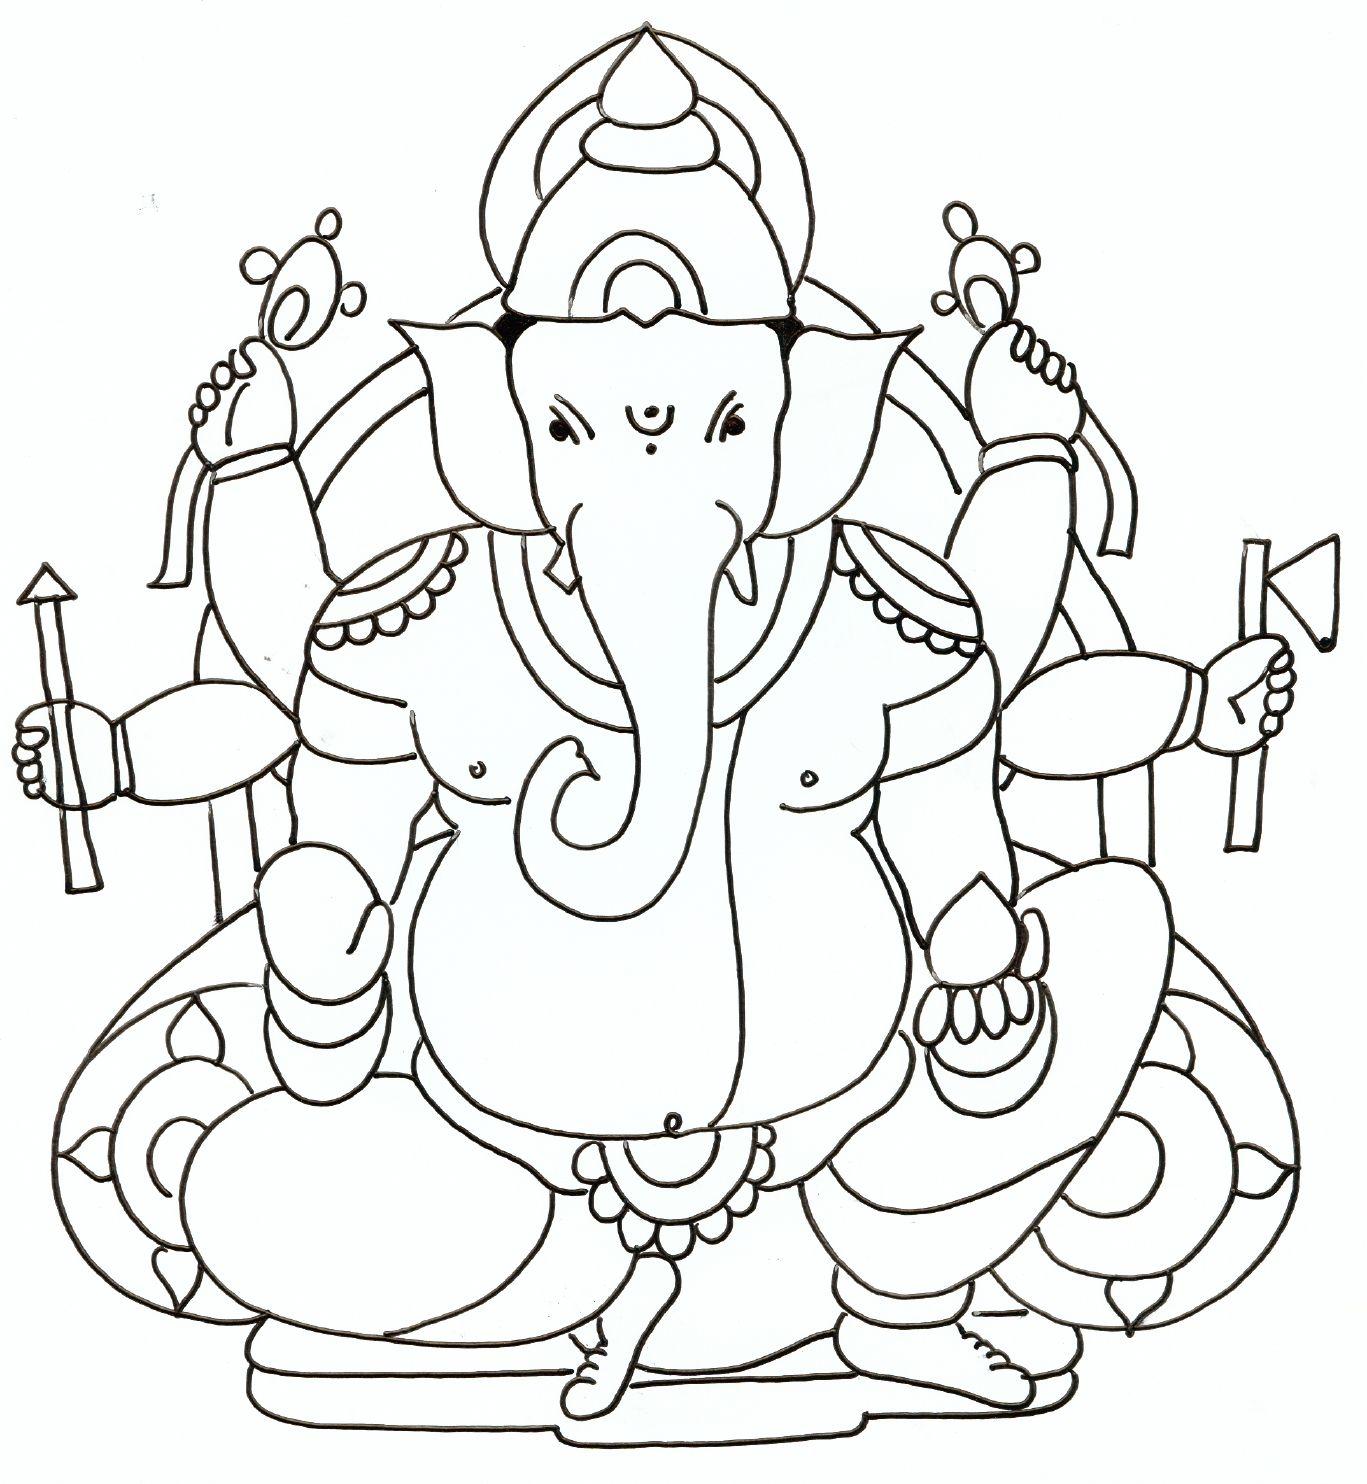 Pencil Art Of Ganesha Photo Wallpaper Pencil Art Drawings Ganesha Art